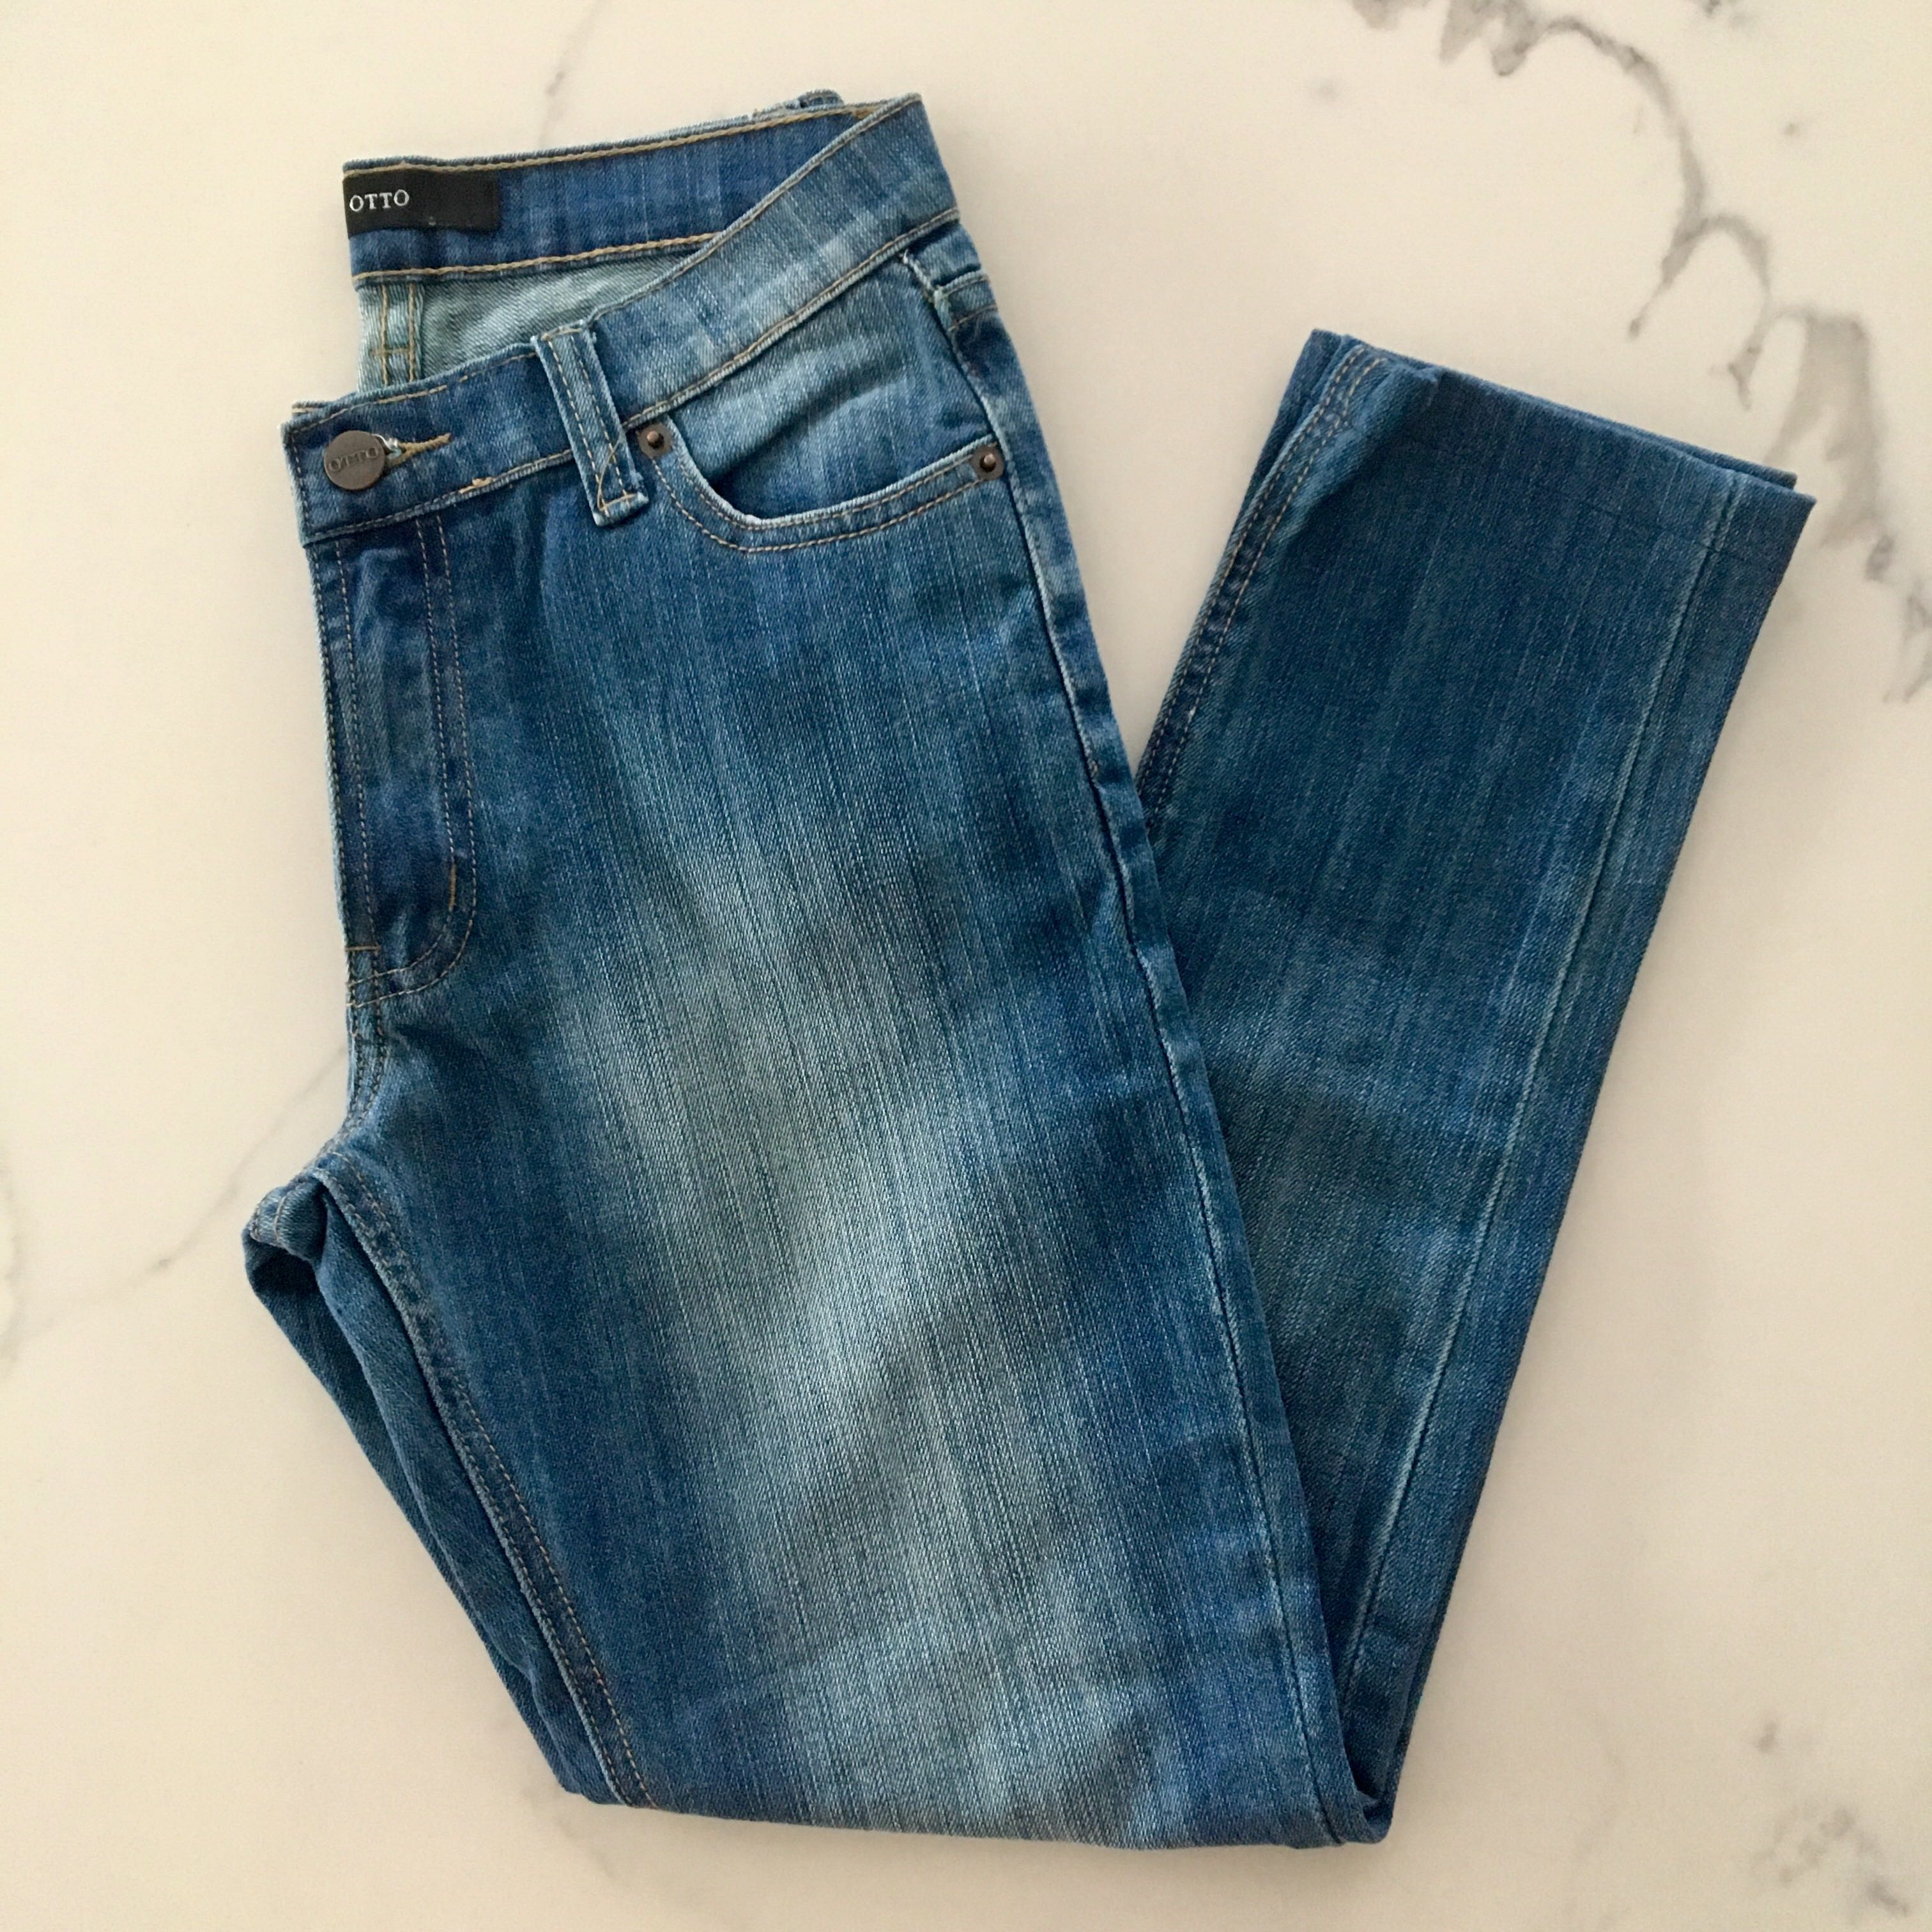 Otto Denim Jeans